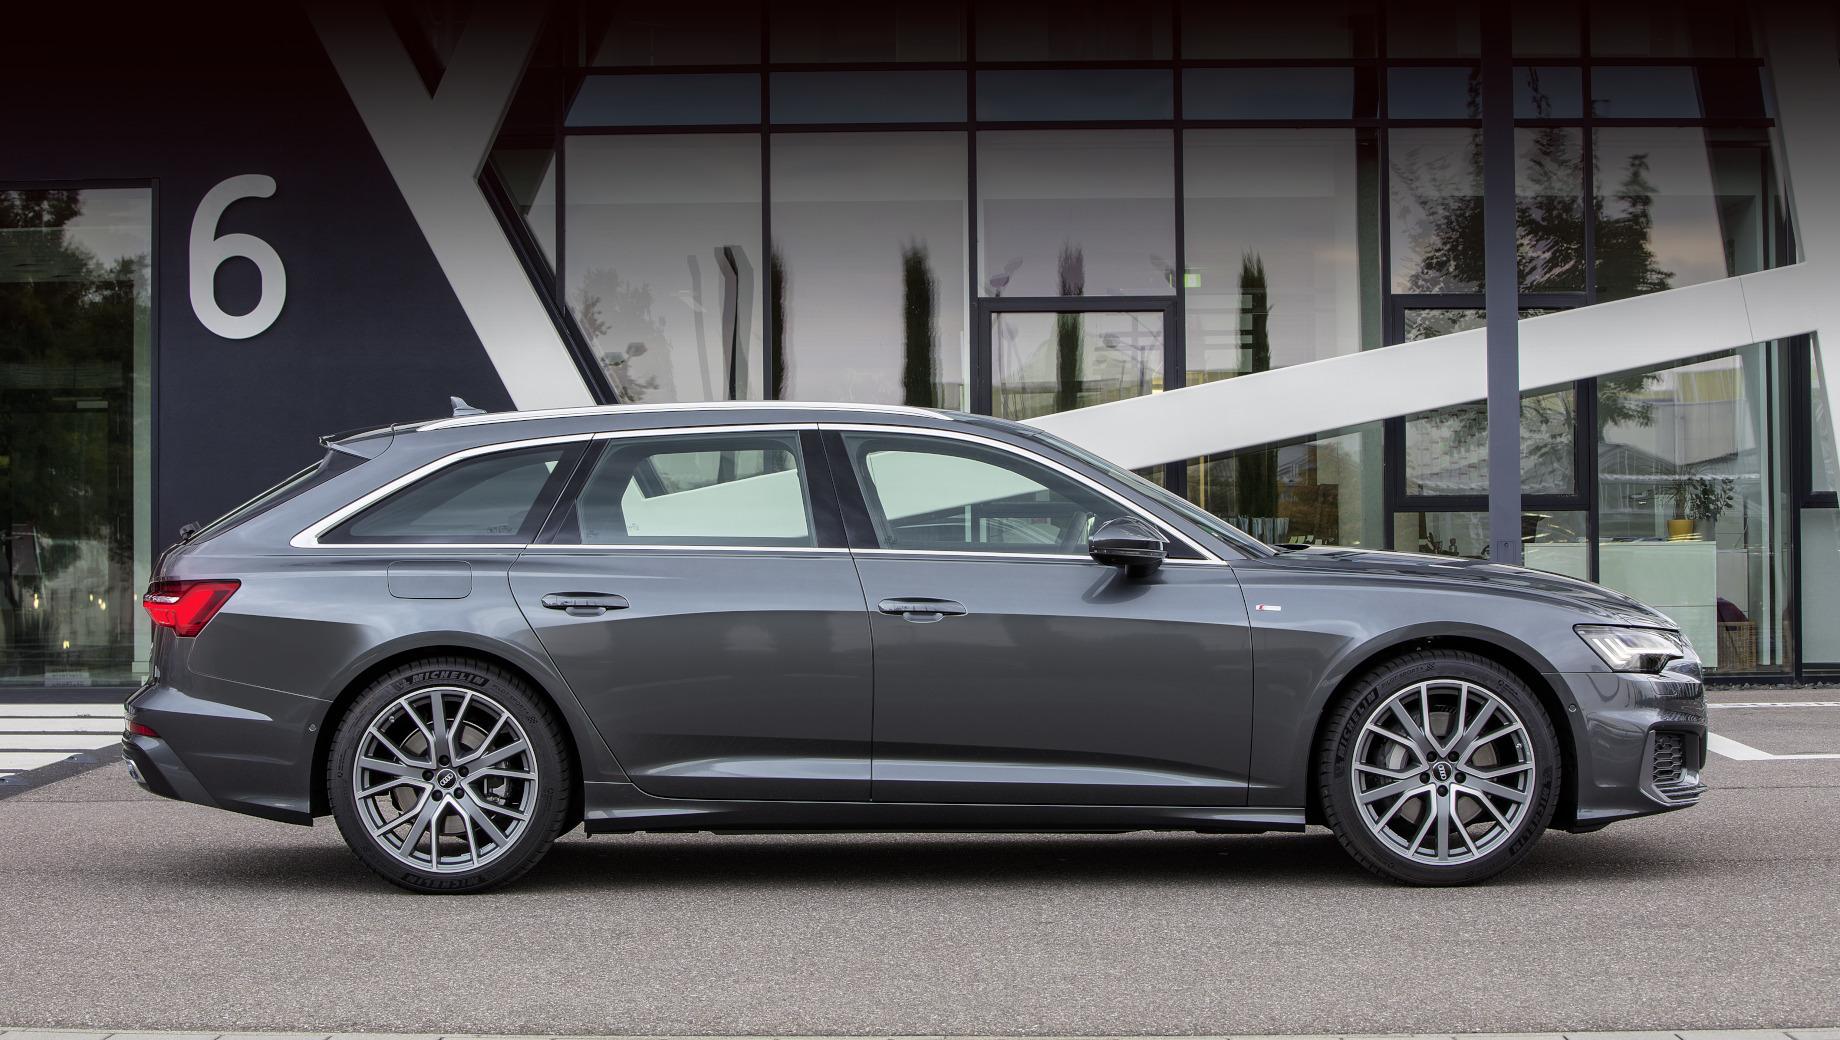 Audi a6,Audi a6 avant,Audi a7,Audi a7 sportback. Автомобили появятся в шоу-румах дилеров в августе 2020 года, уверяет компания.